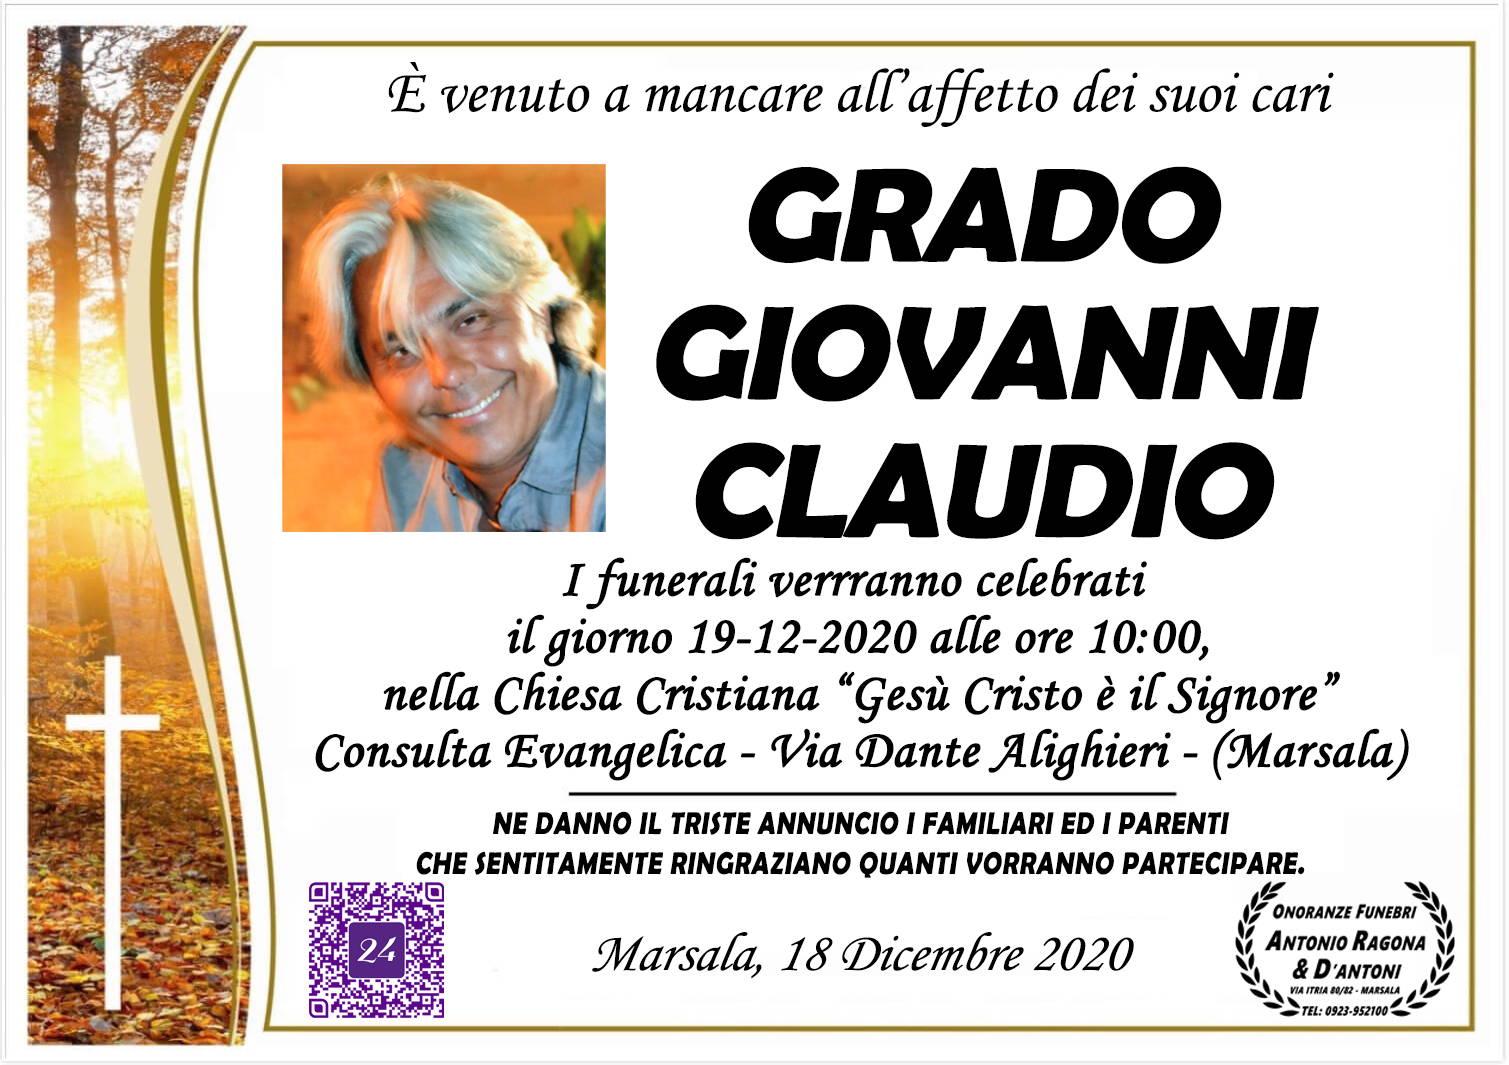 Giovanni Claudio Grado